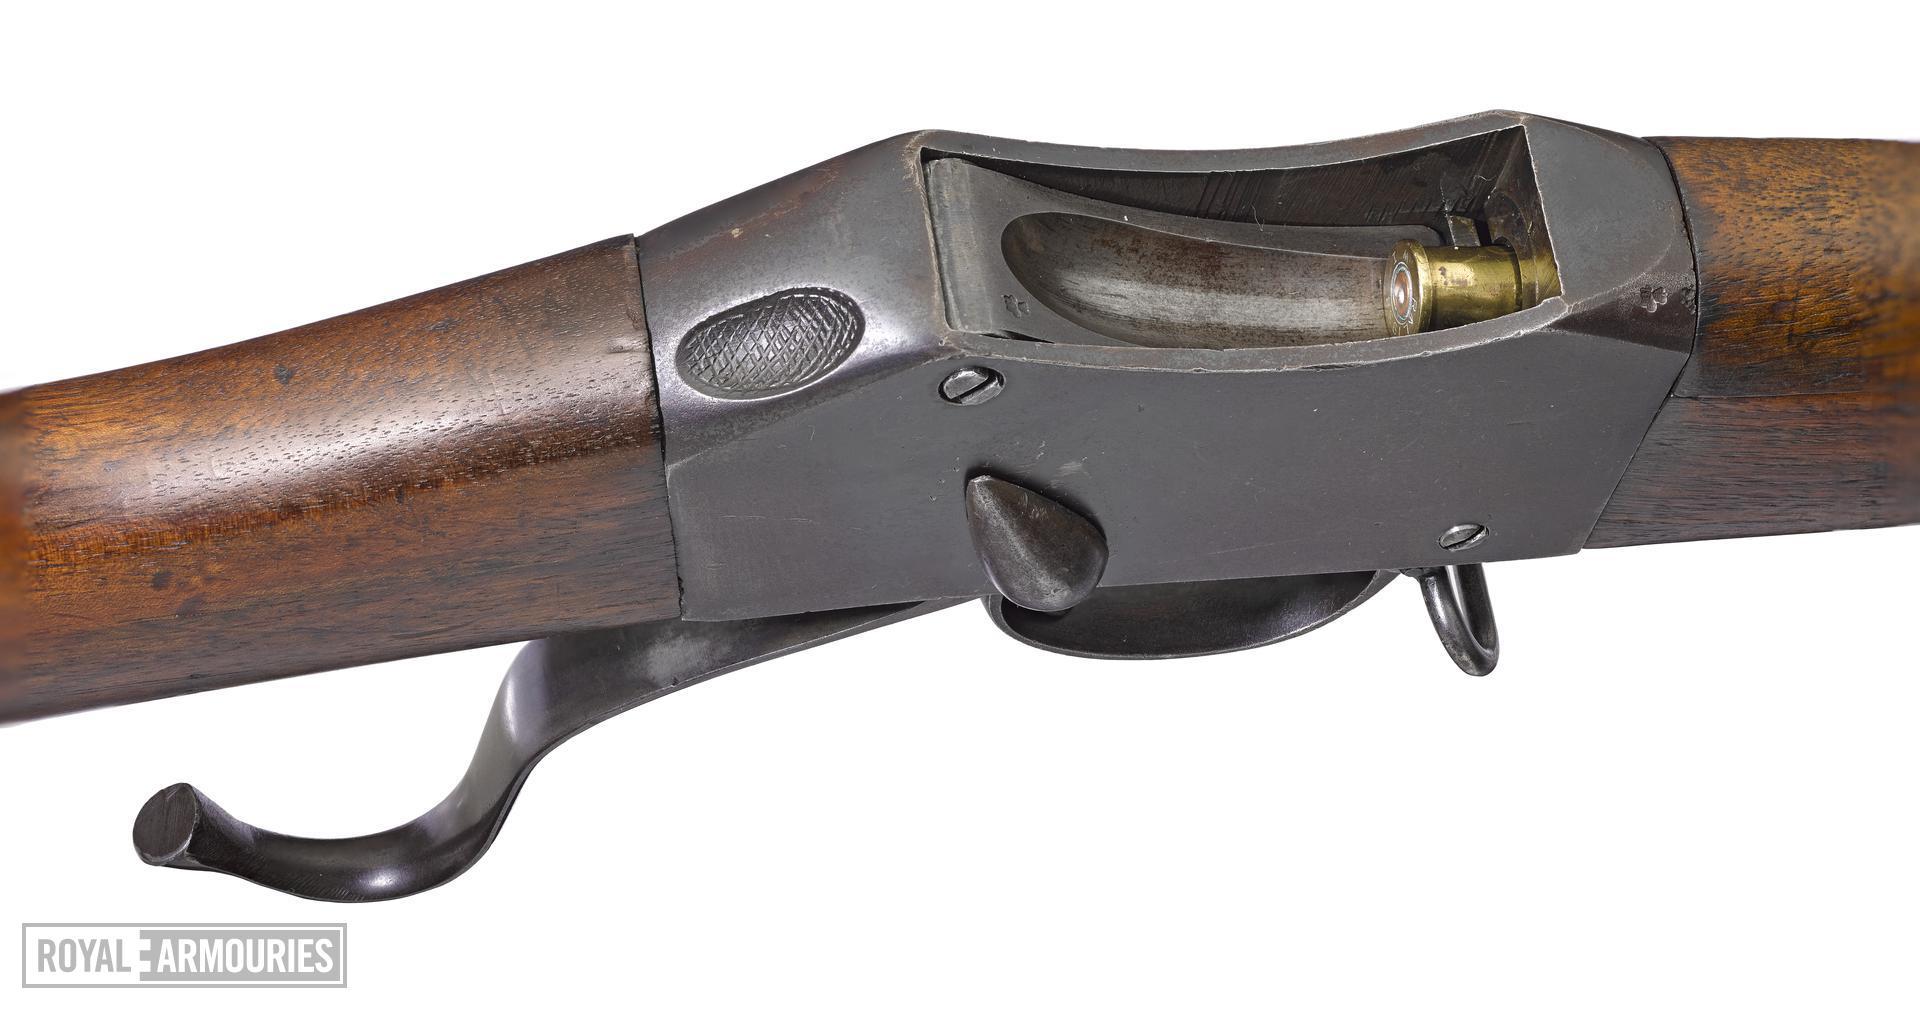 Martini-Enfield VTC Model centrefire breech loading rifle, Birmingham, Britain, about 1914, by W.M Ford Birmingham